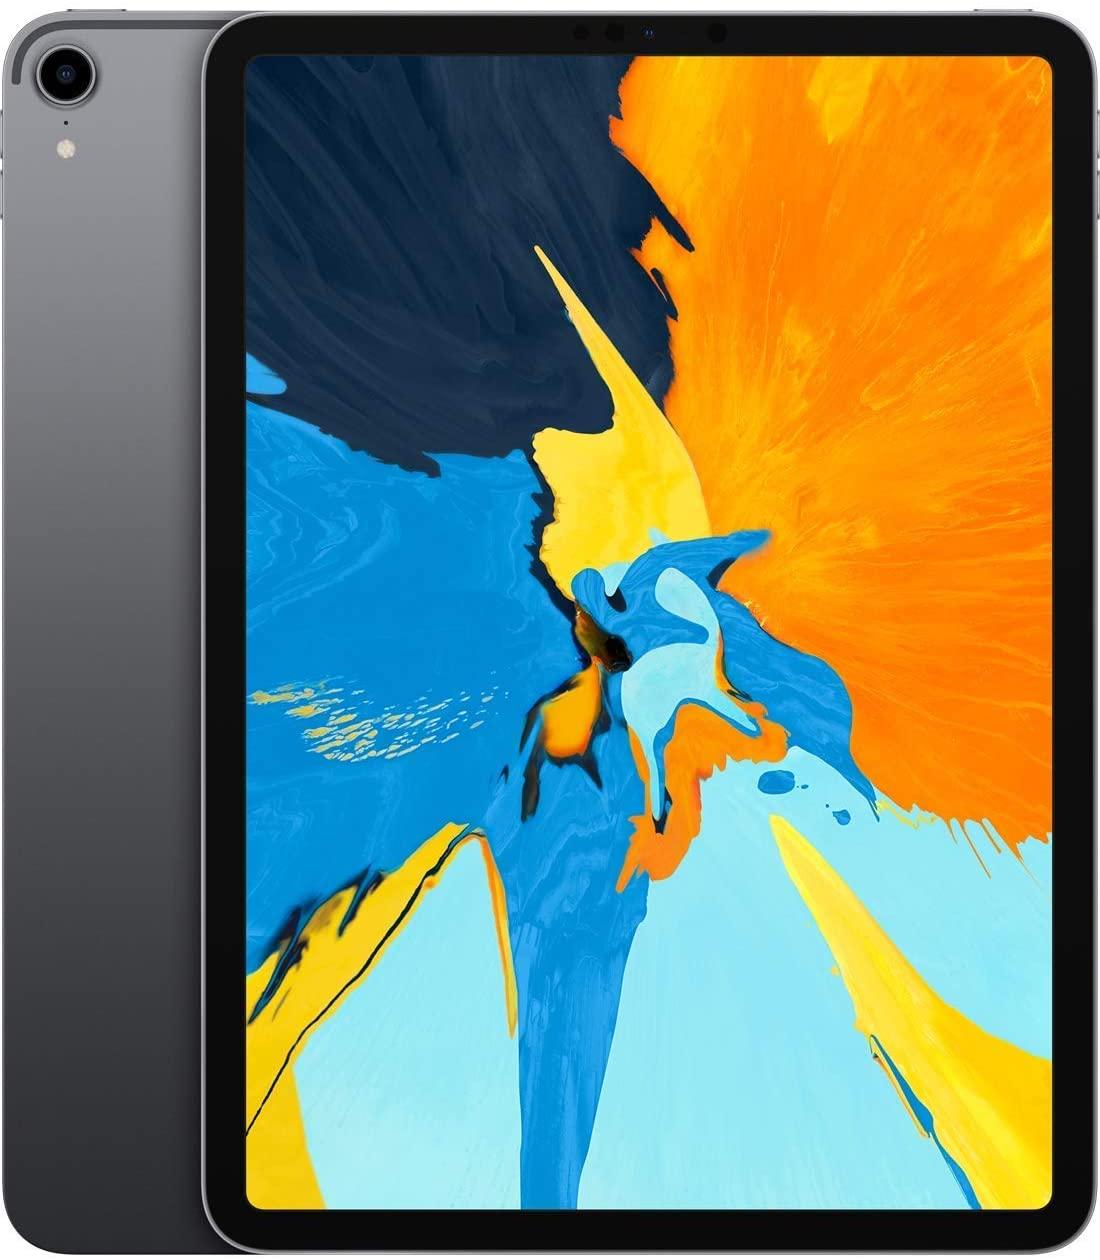 iPad Pro 11 (2018) 256GB 'Used' - Pristine Condition £594.22 w/code @ music magpie / eBay